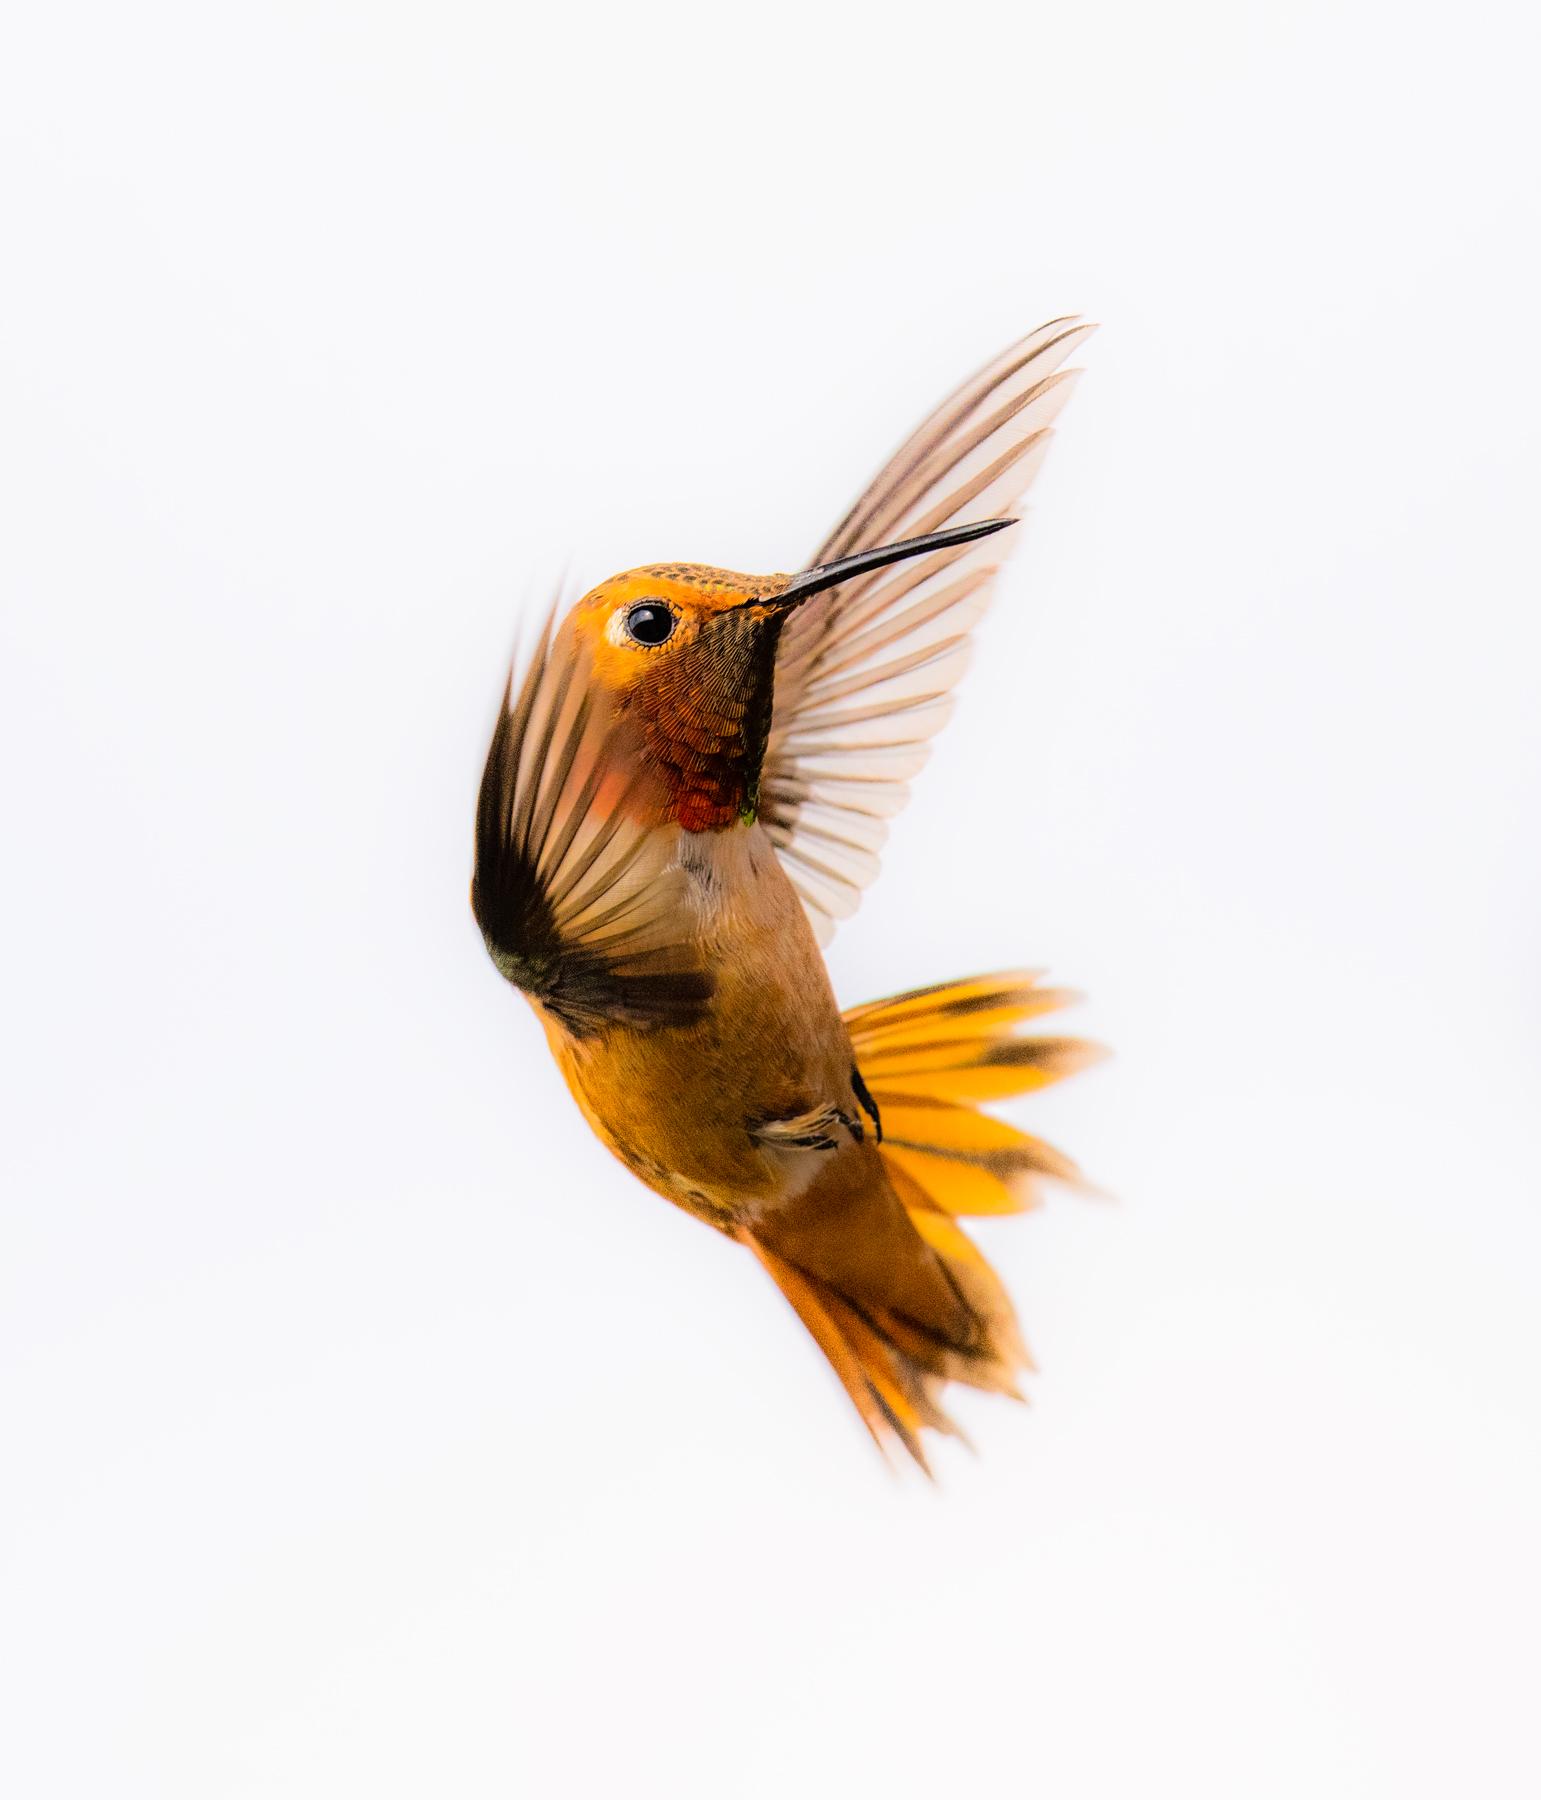 Hummingbird Close Up 1 SV web.jpg